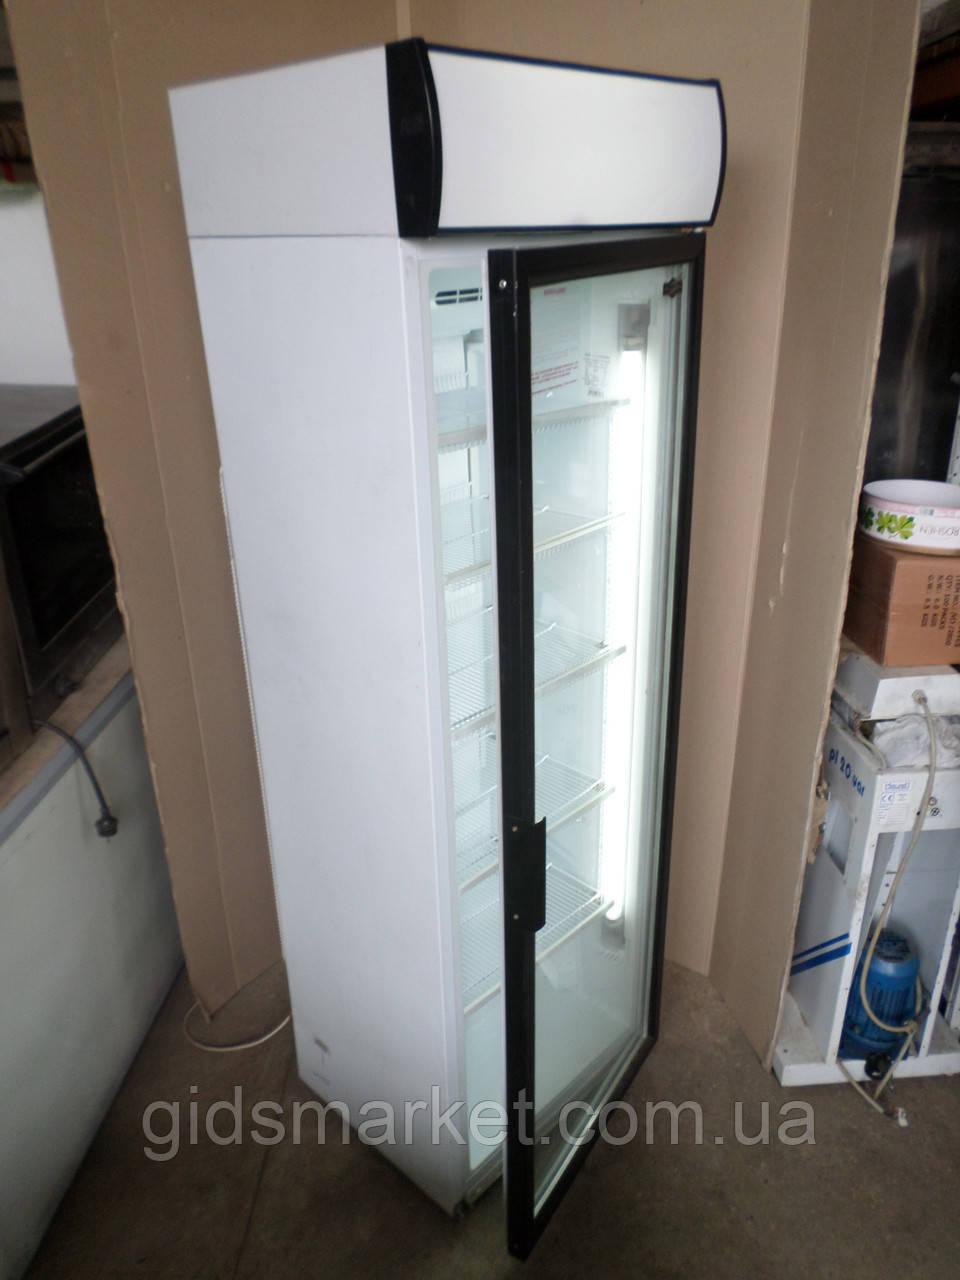 Шкаф холодильный однодверный Интер бу, холодильник однодверный б/у